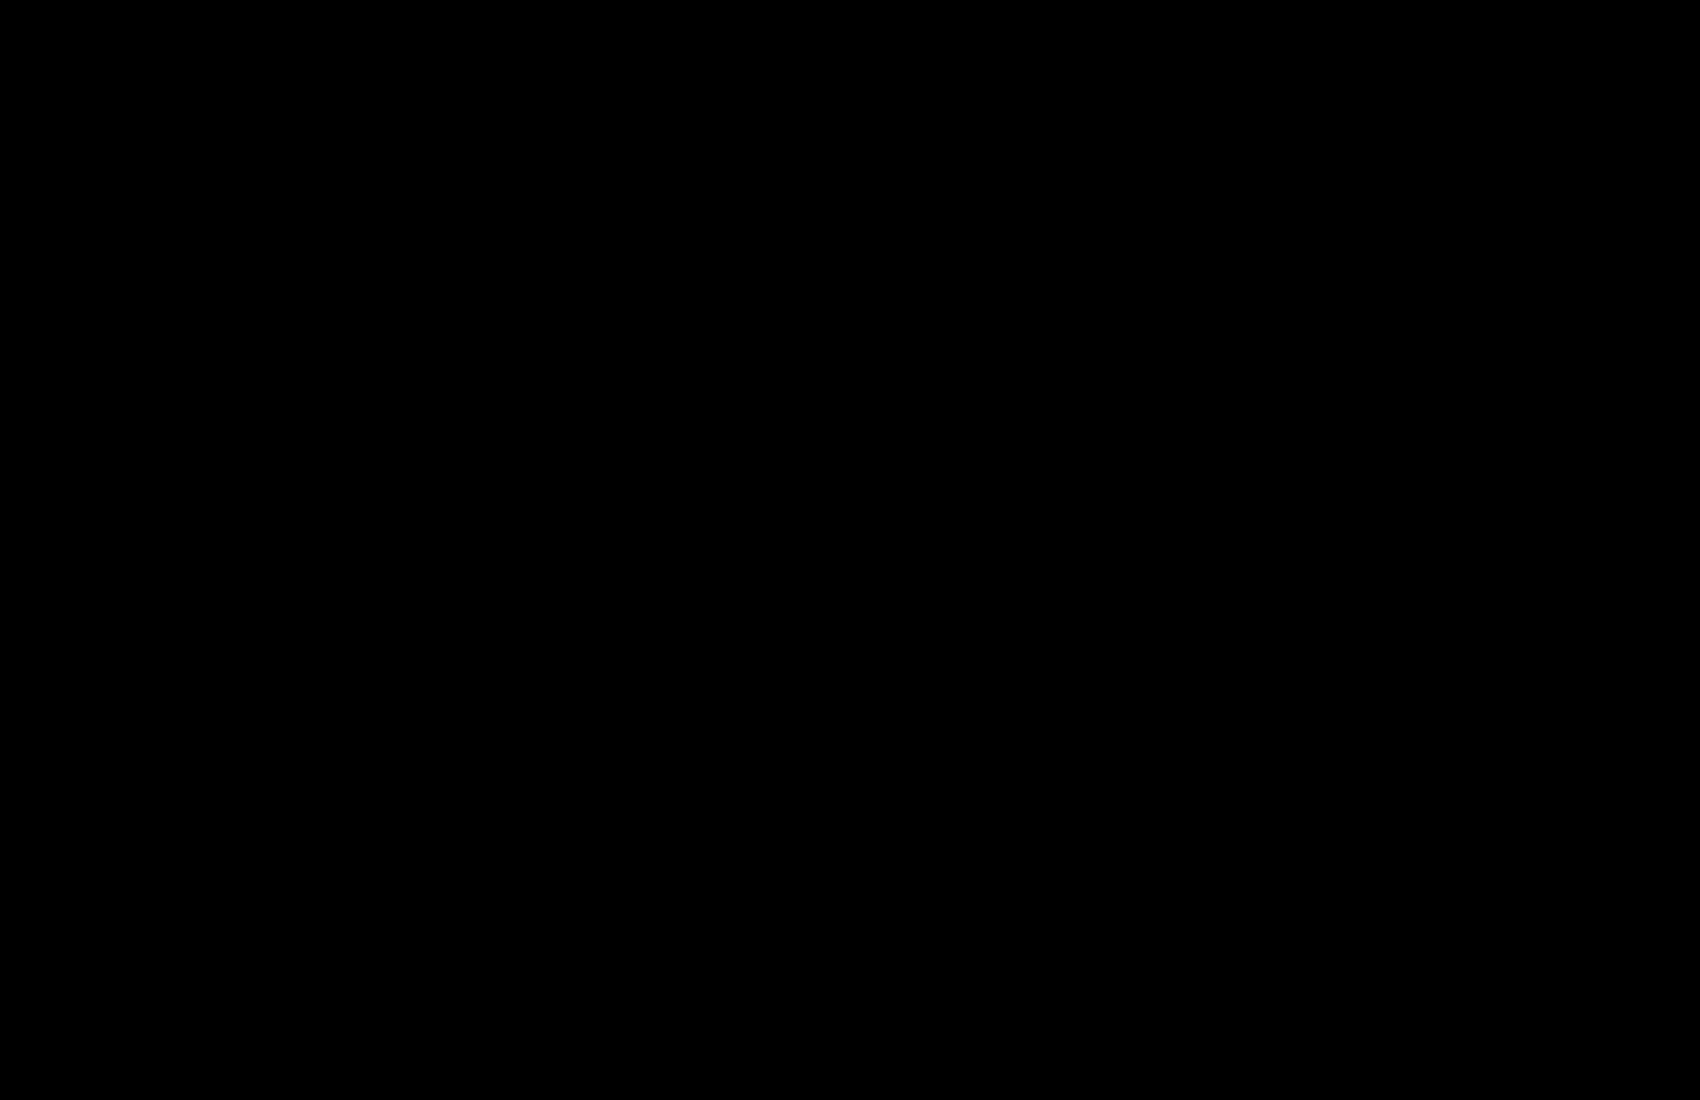 jessie-dore-logo-black (1).png